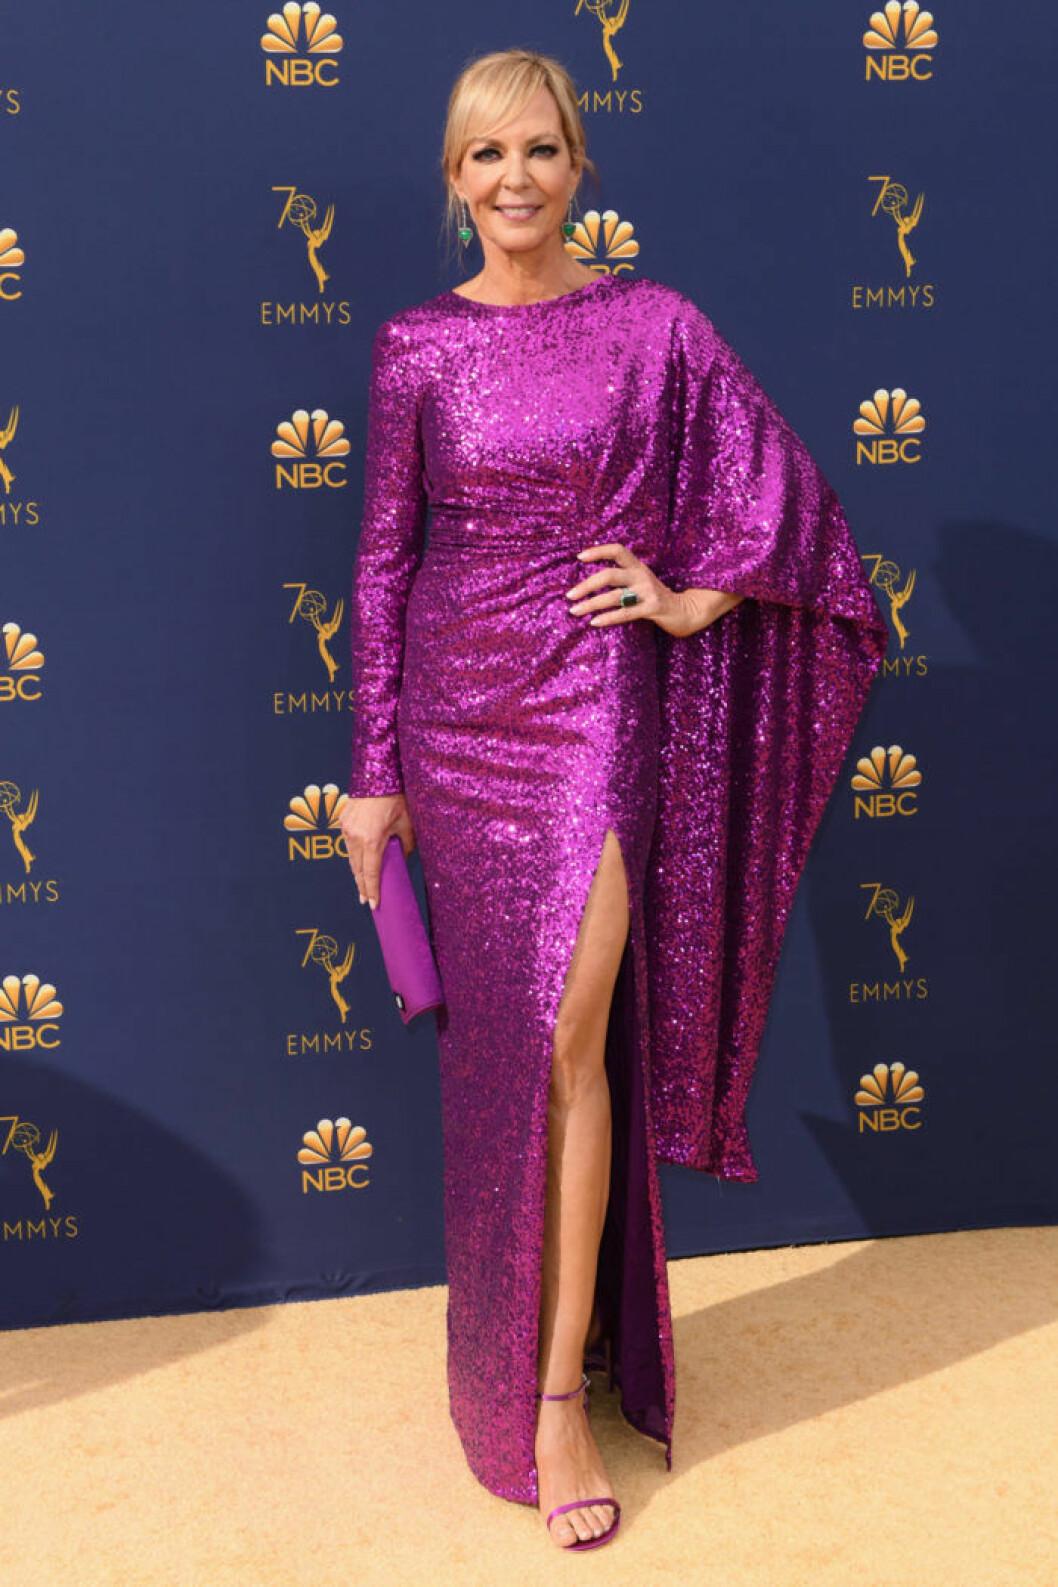 Allison Janney Emmygalan 2018